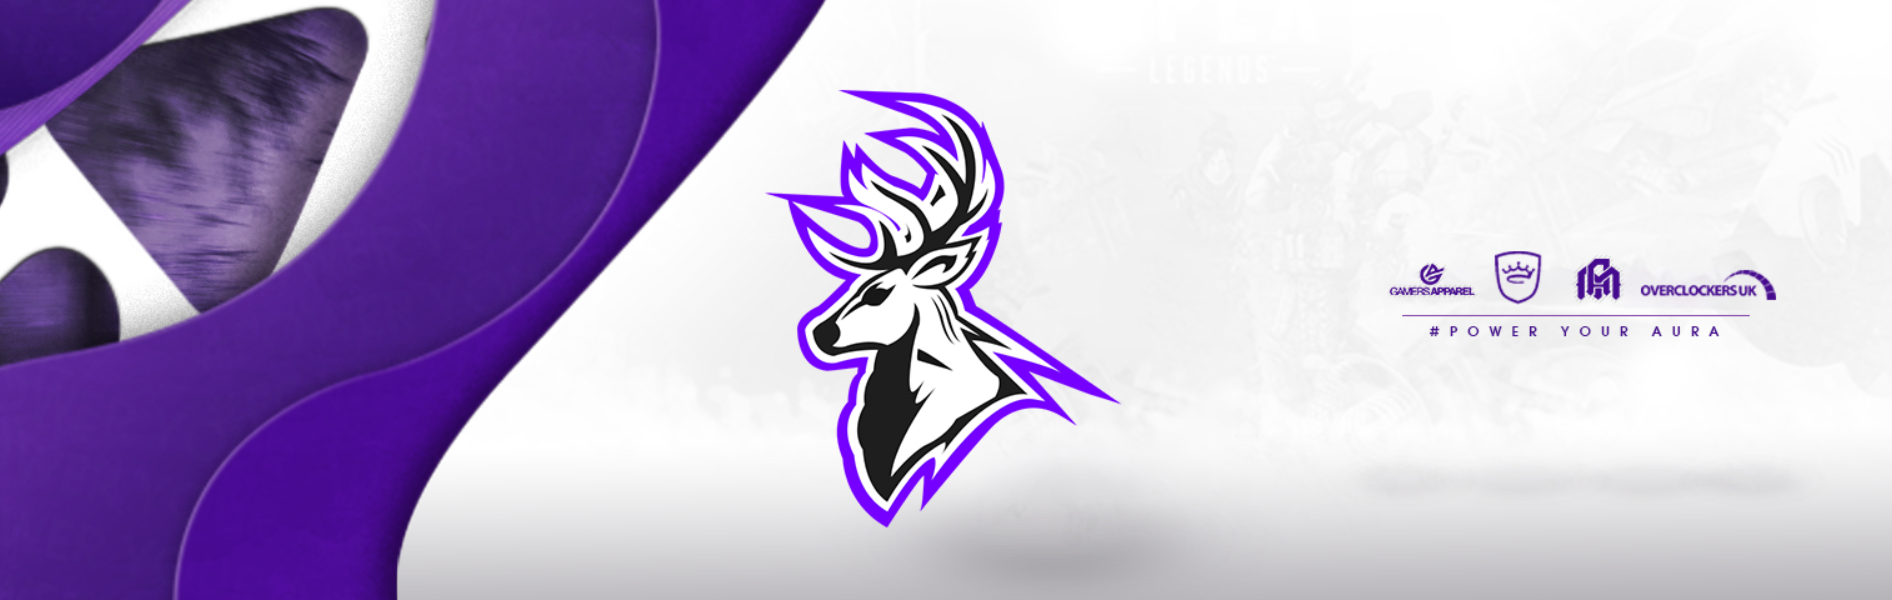 Aura Esports LTD Banner